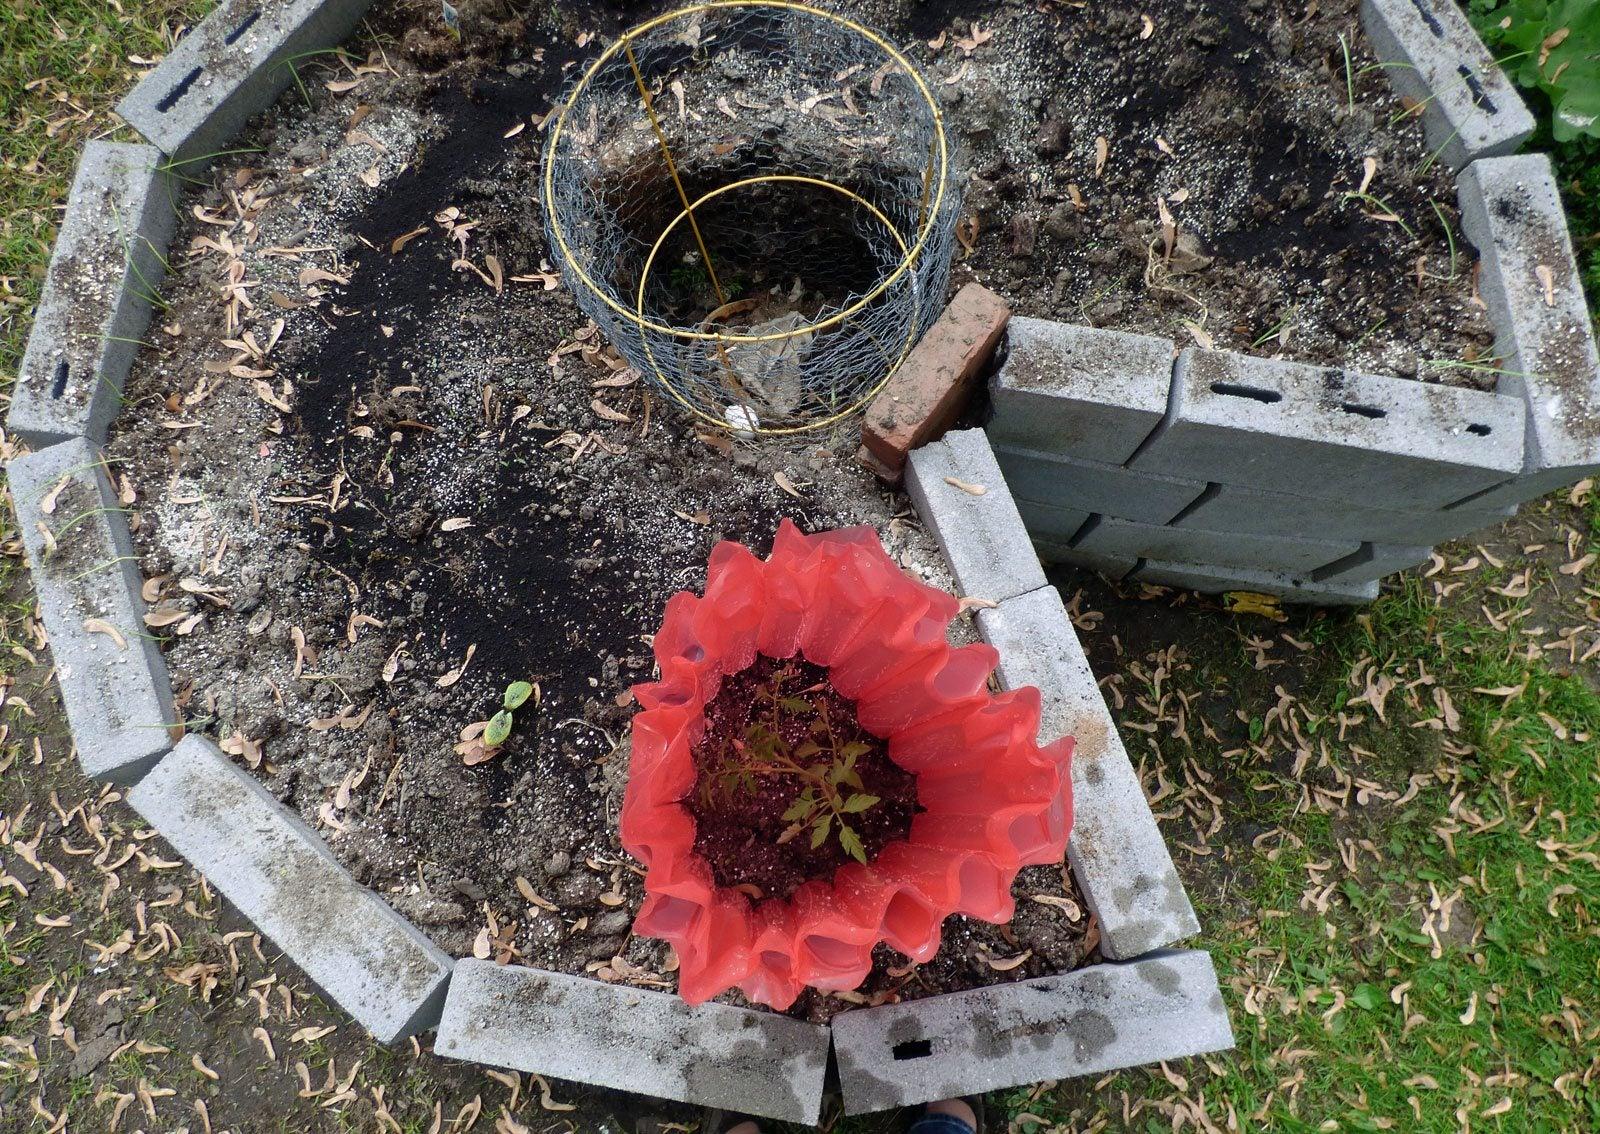 Keyhole gardening create keyhole garden beds in your garden for Keyhole garden designs